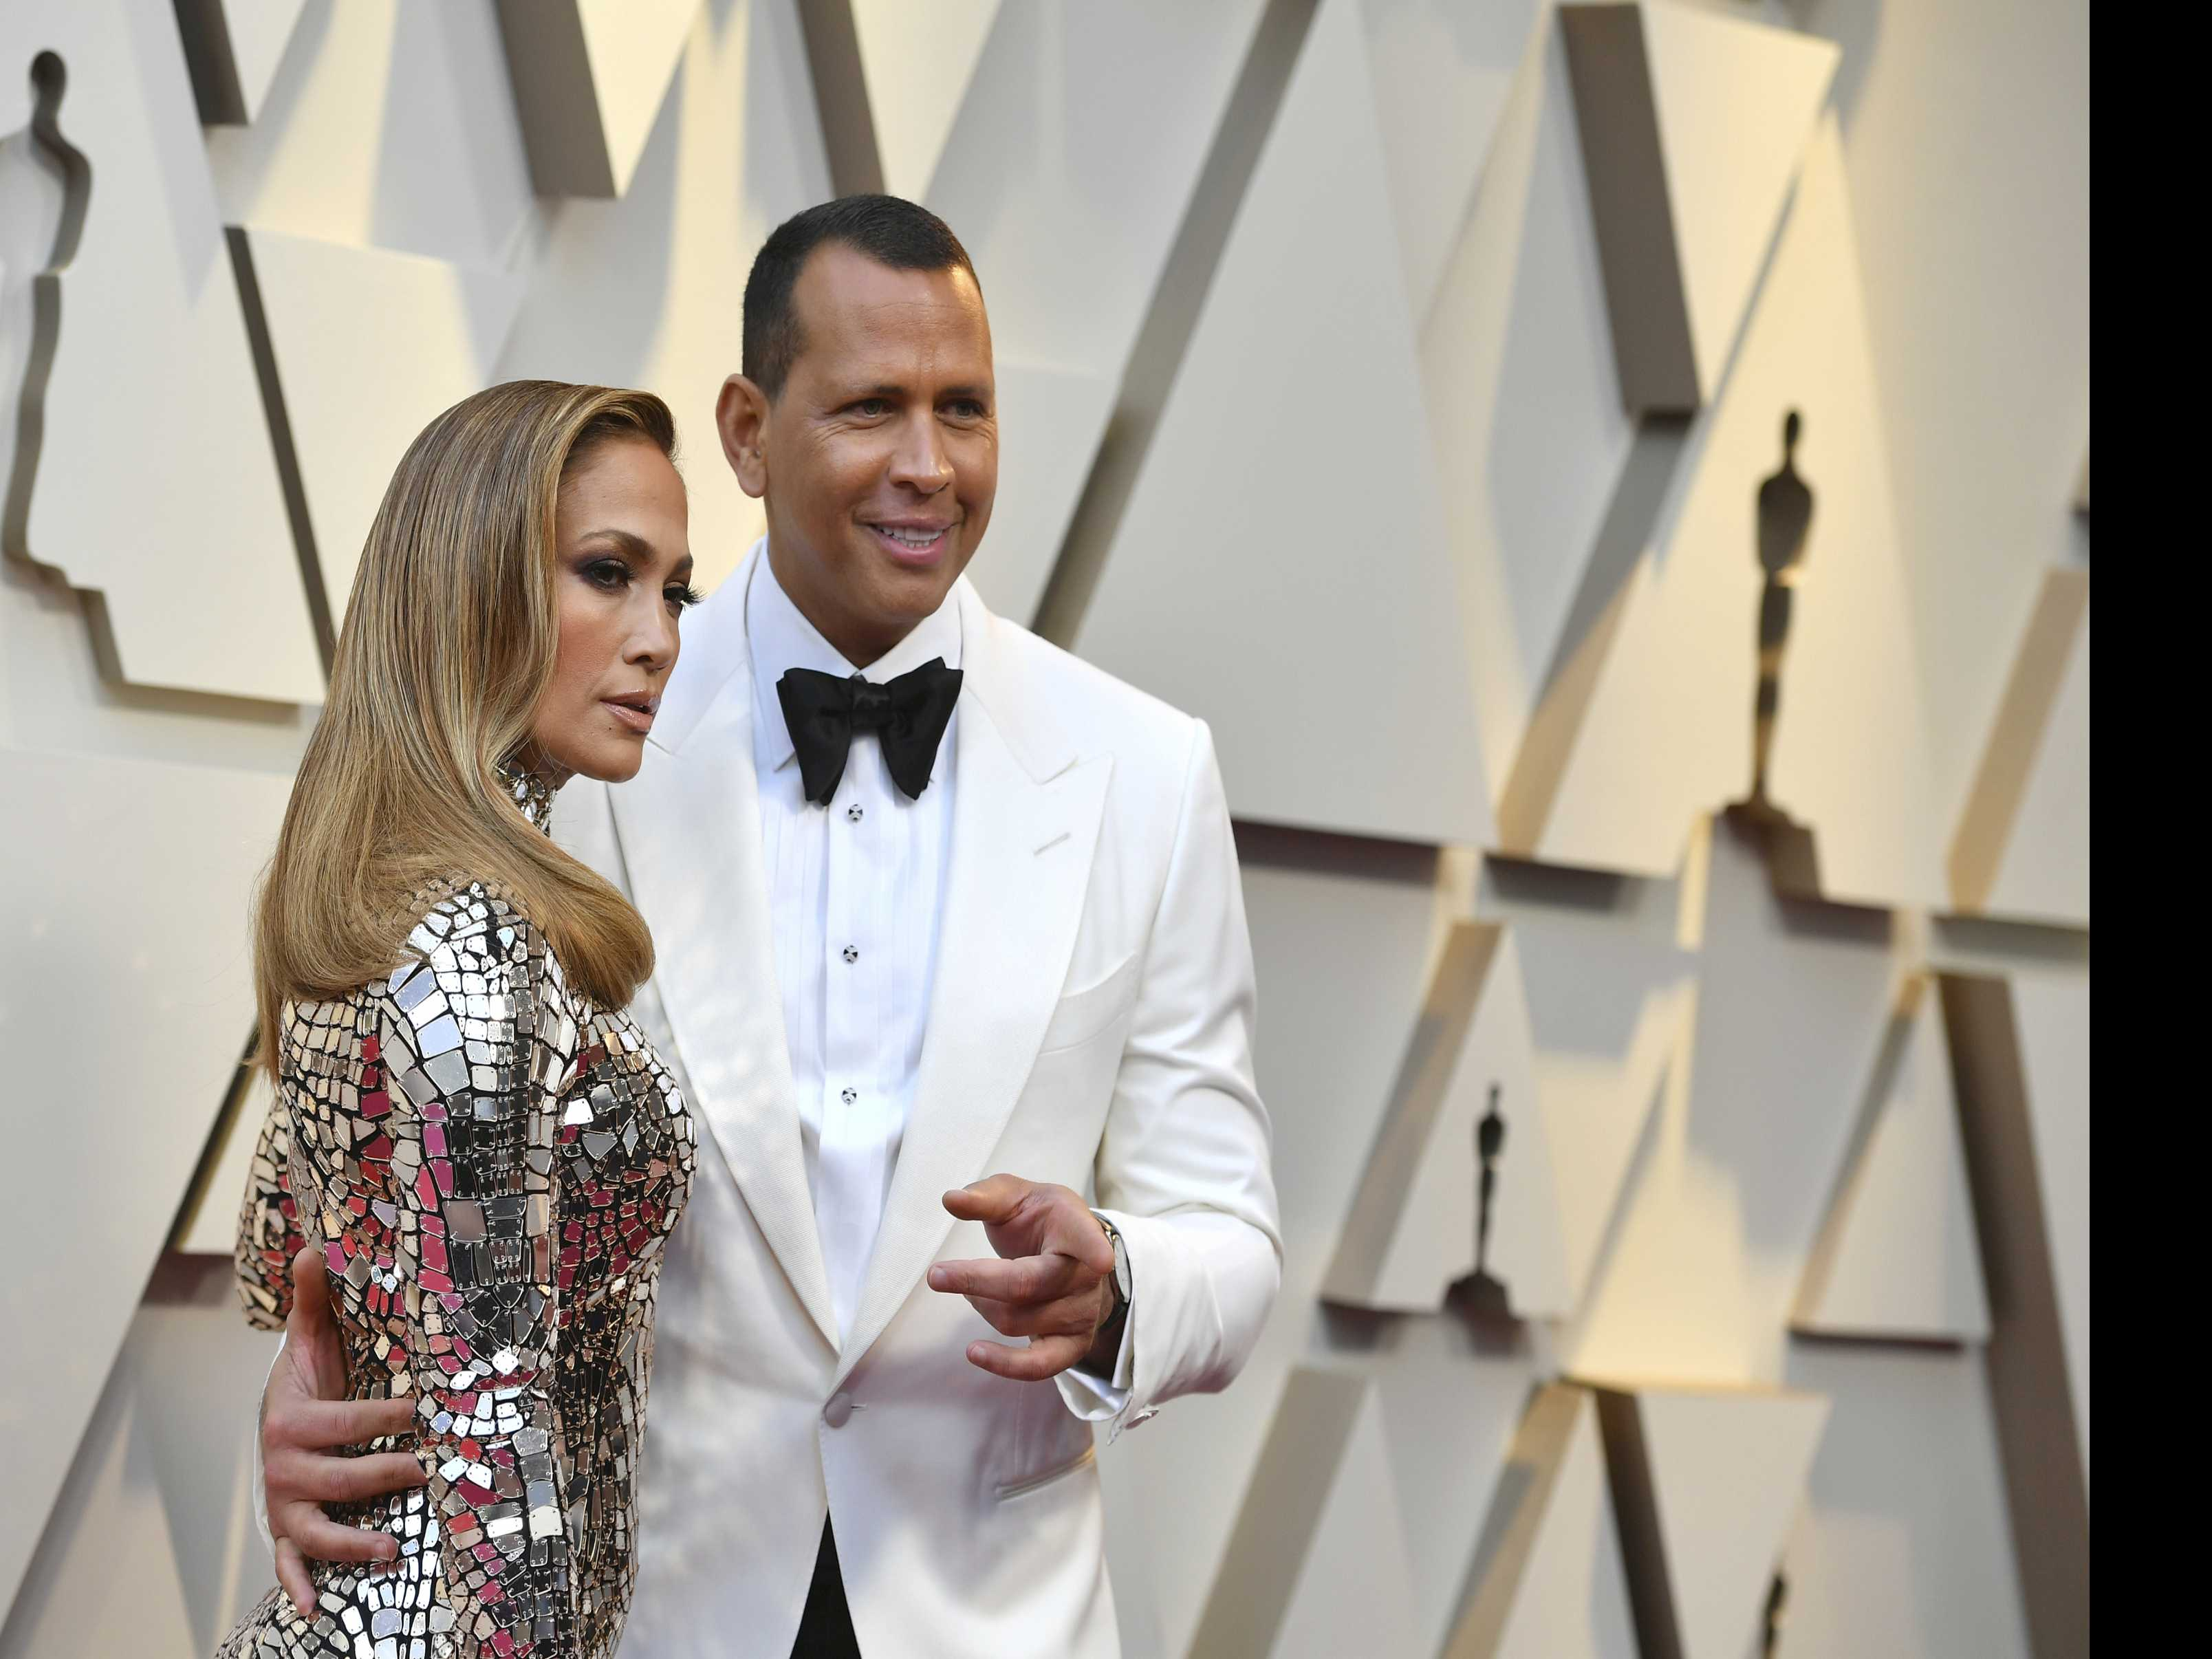 Barack Obama Congratulates A-Rod J. Lo on Their Engagement